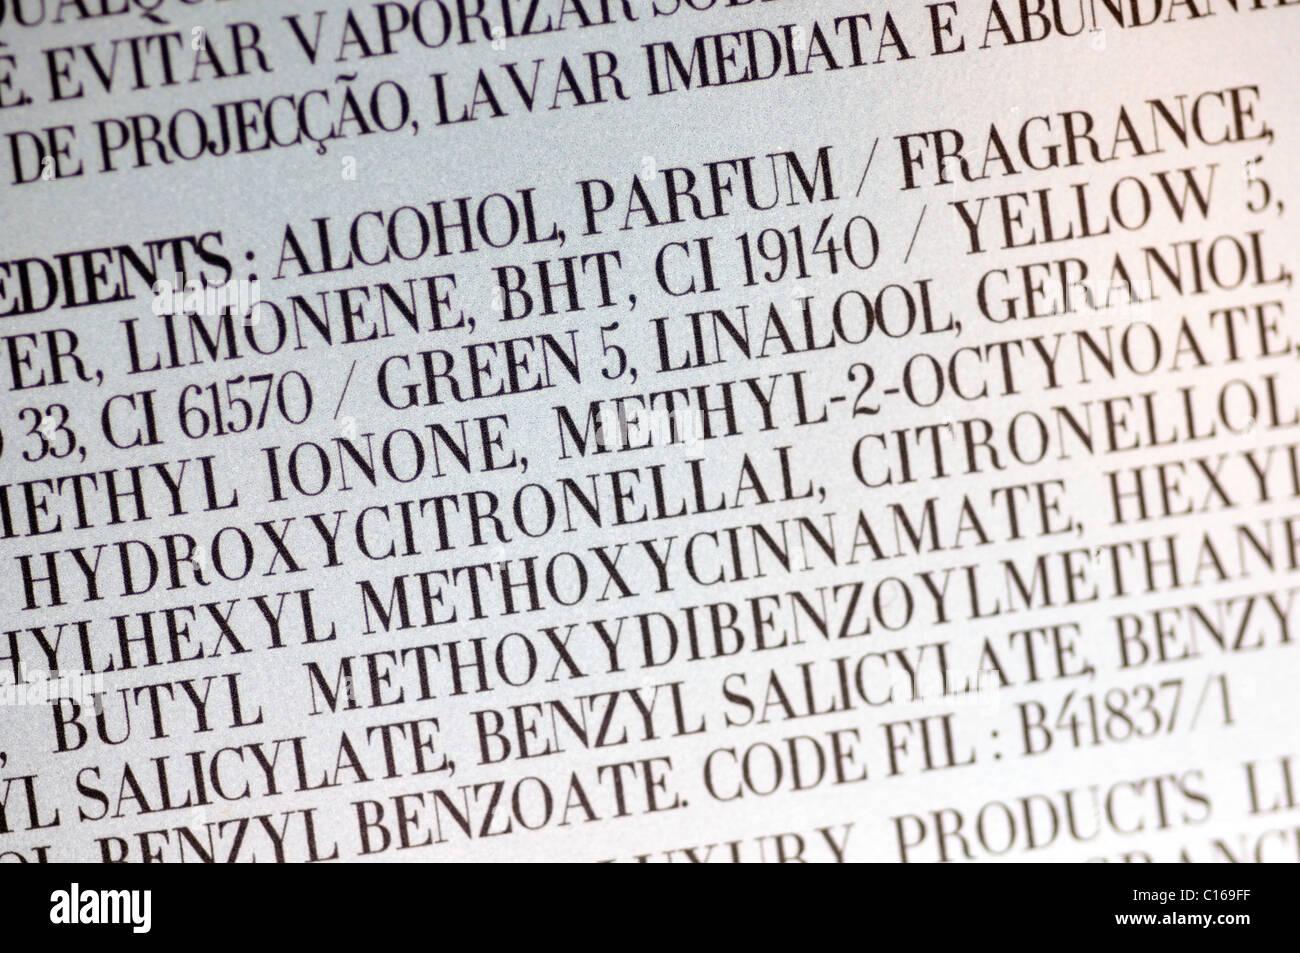 Perfume Ingredients Ingredient List Stock Photos & Perfume